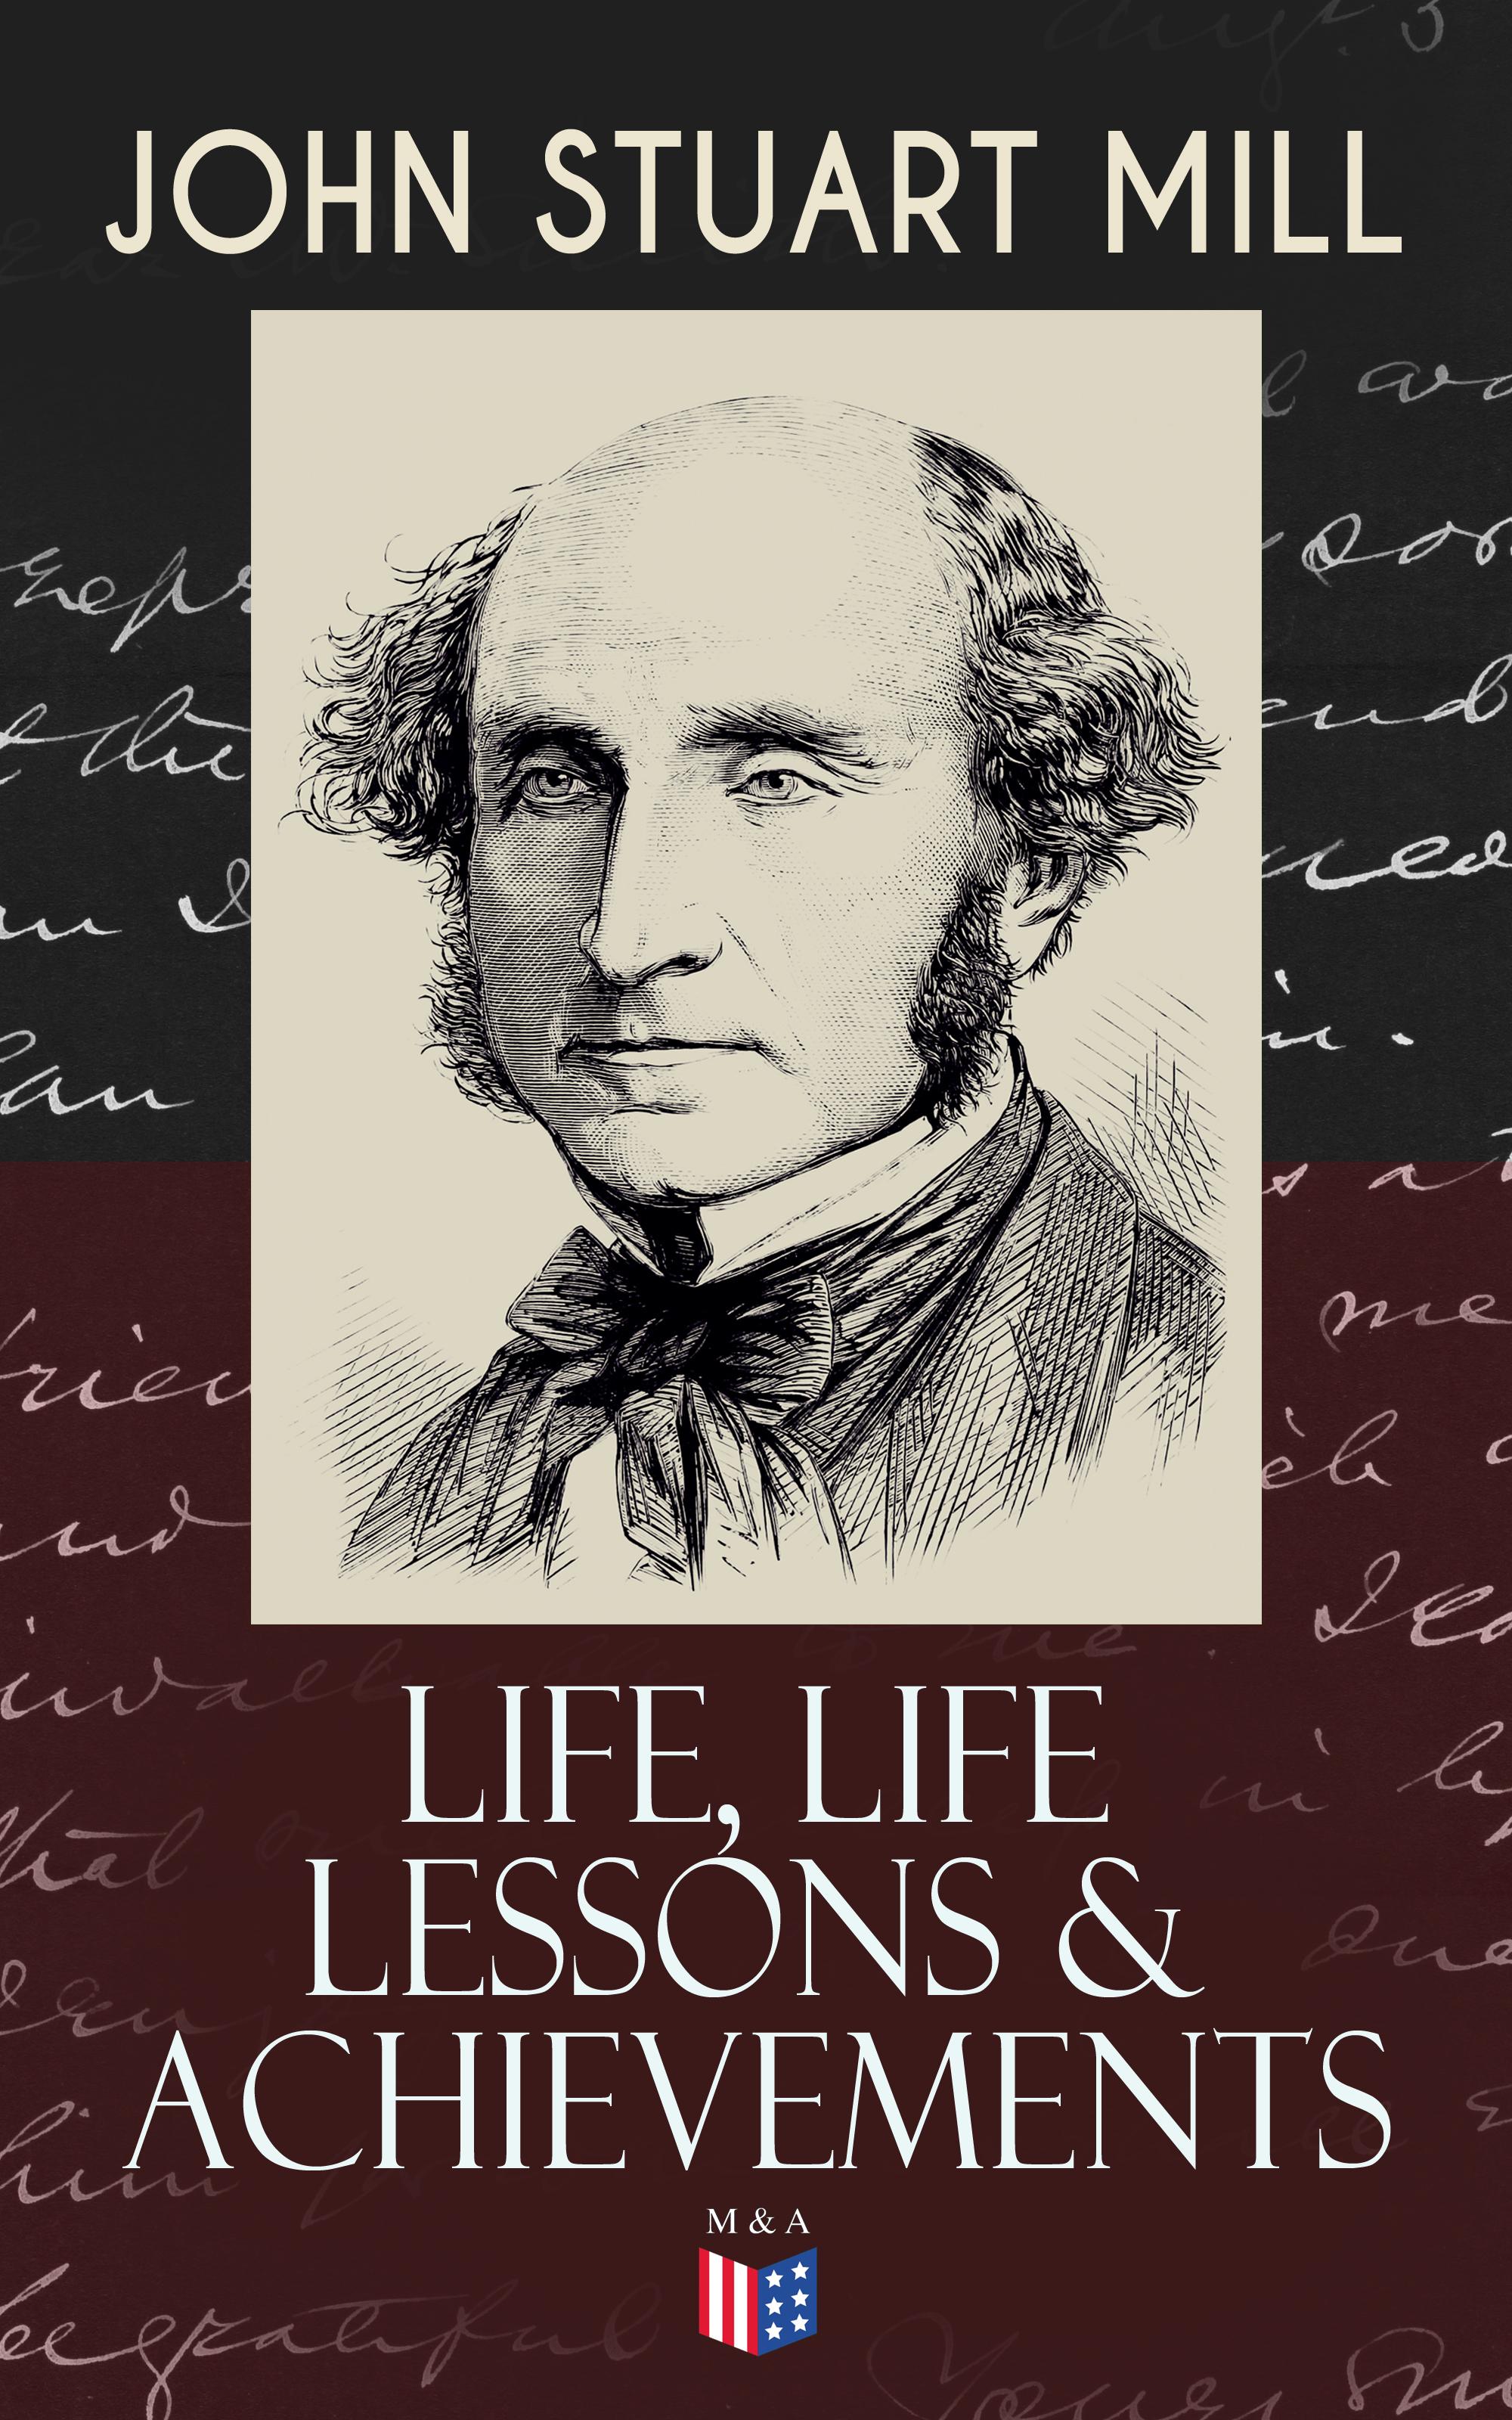 John Stuart Mill John Stuart Mill: Life, Life Lessons & Achievements buckstone john baldwin single life